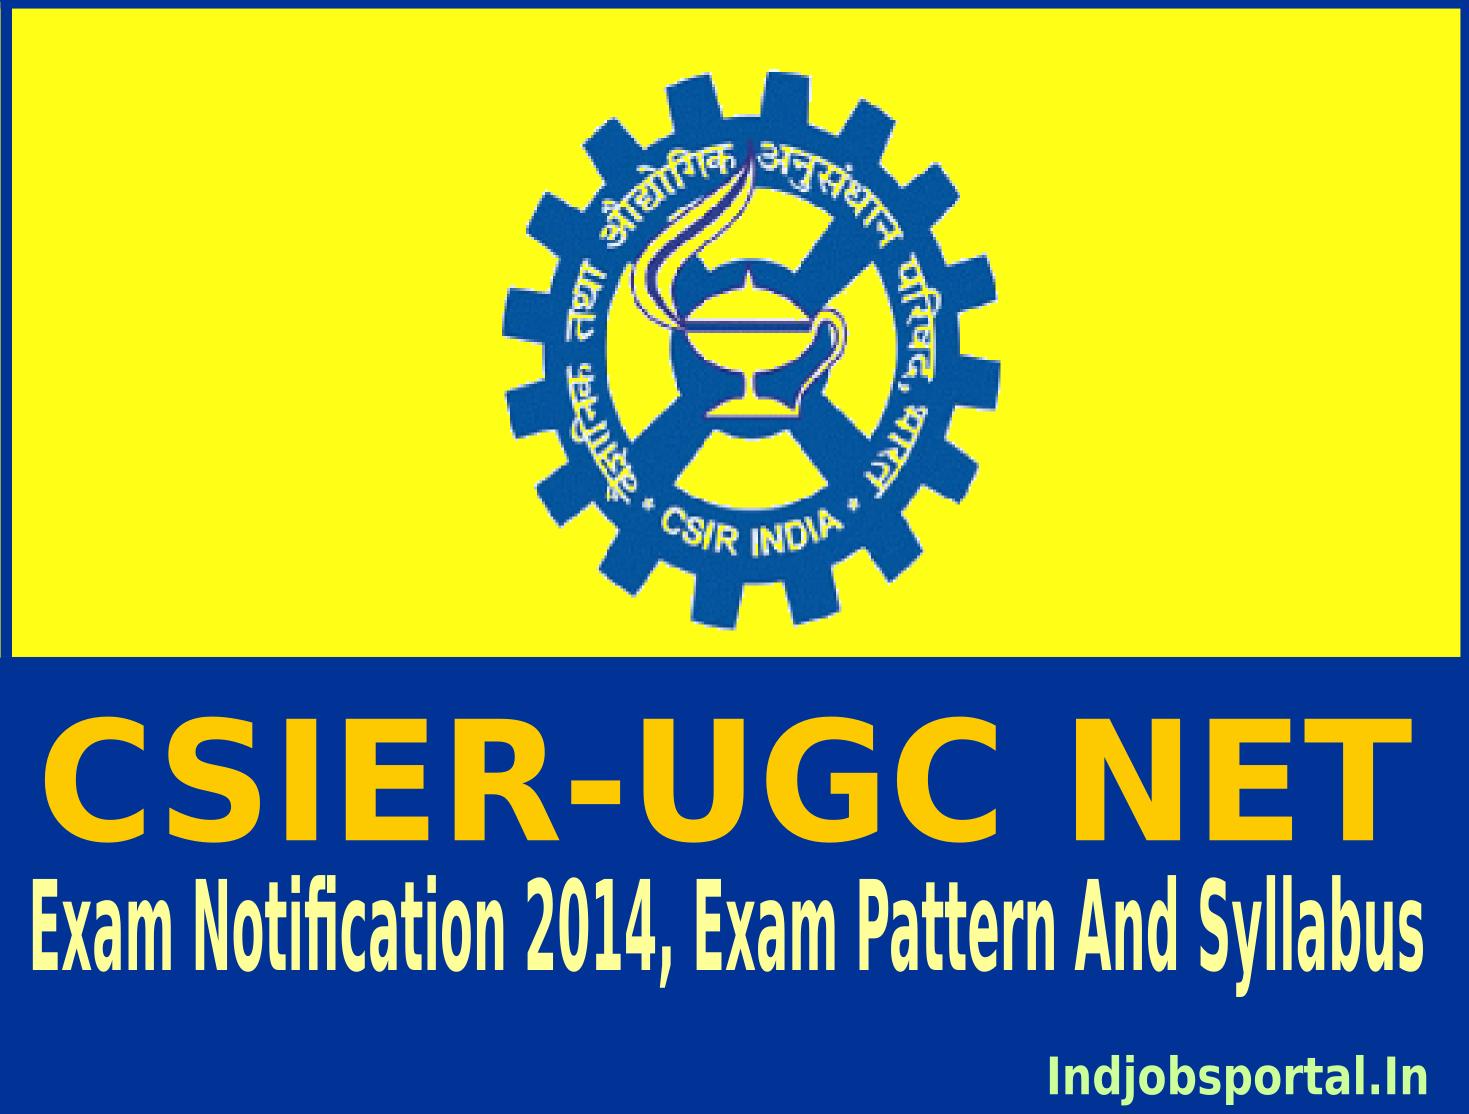 CSIER-UGC NET Exam Notification 2014, Exam Pattern And Syllabus